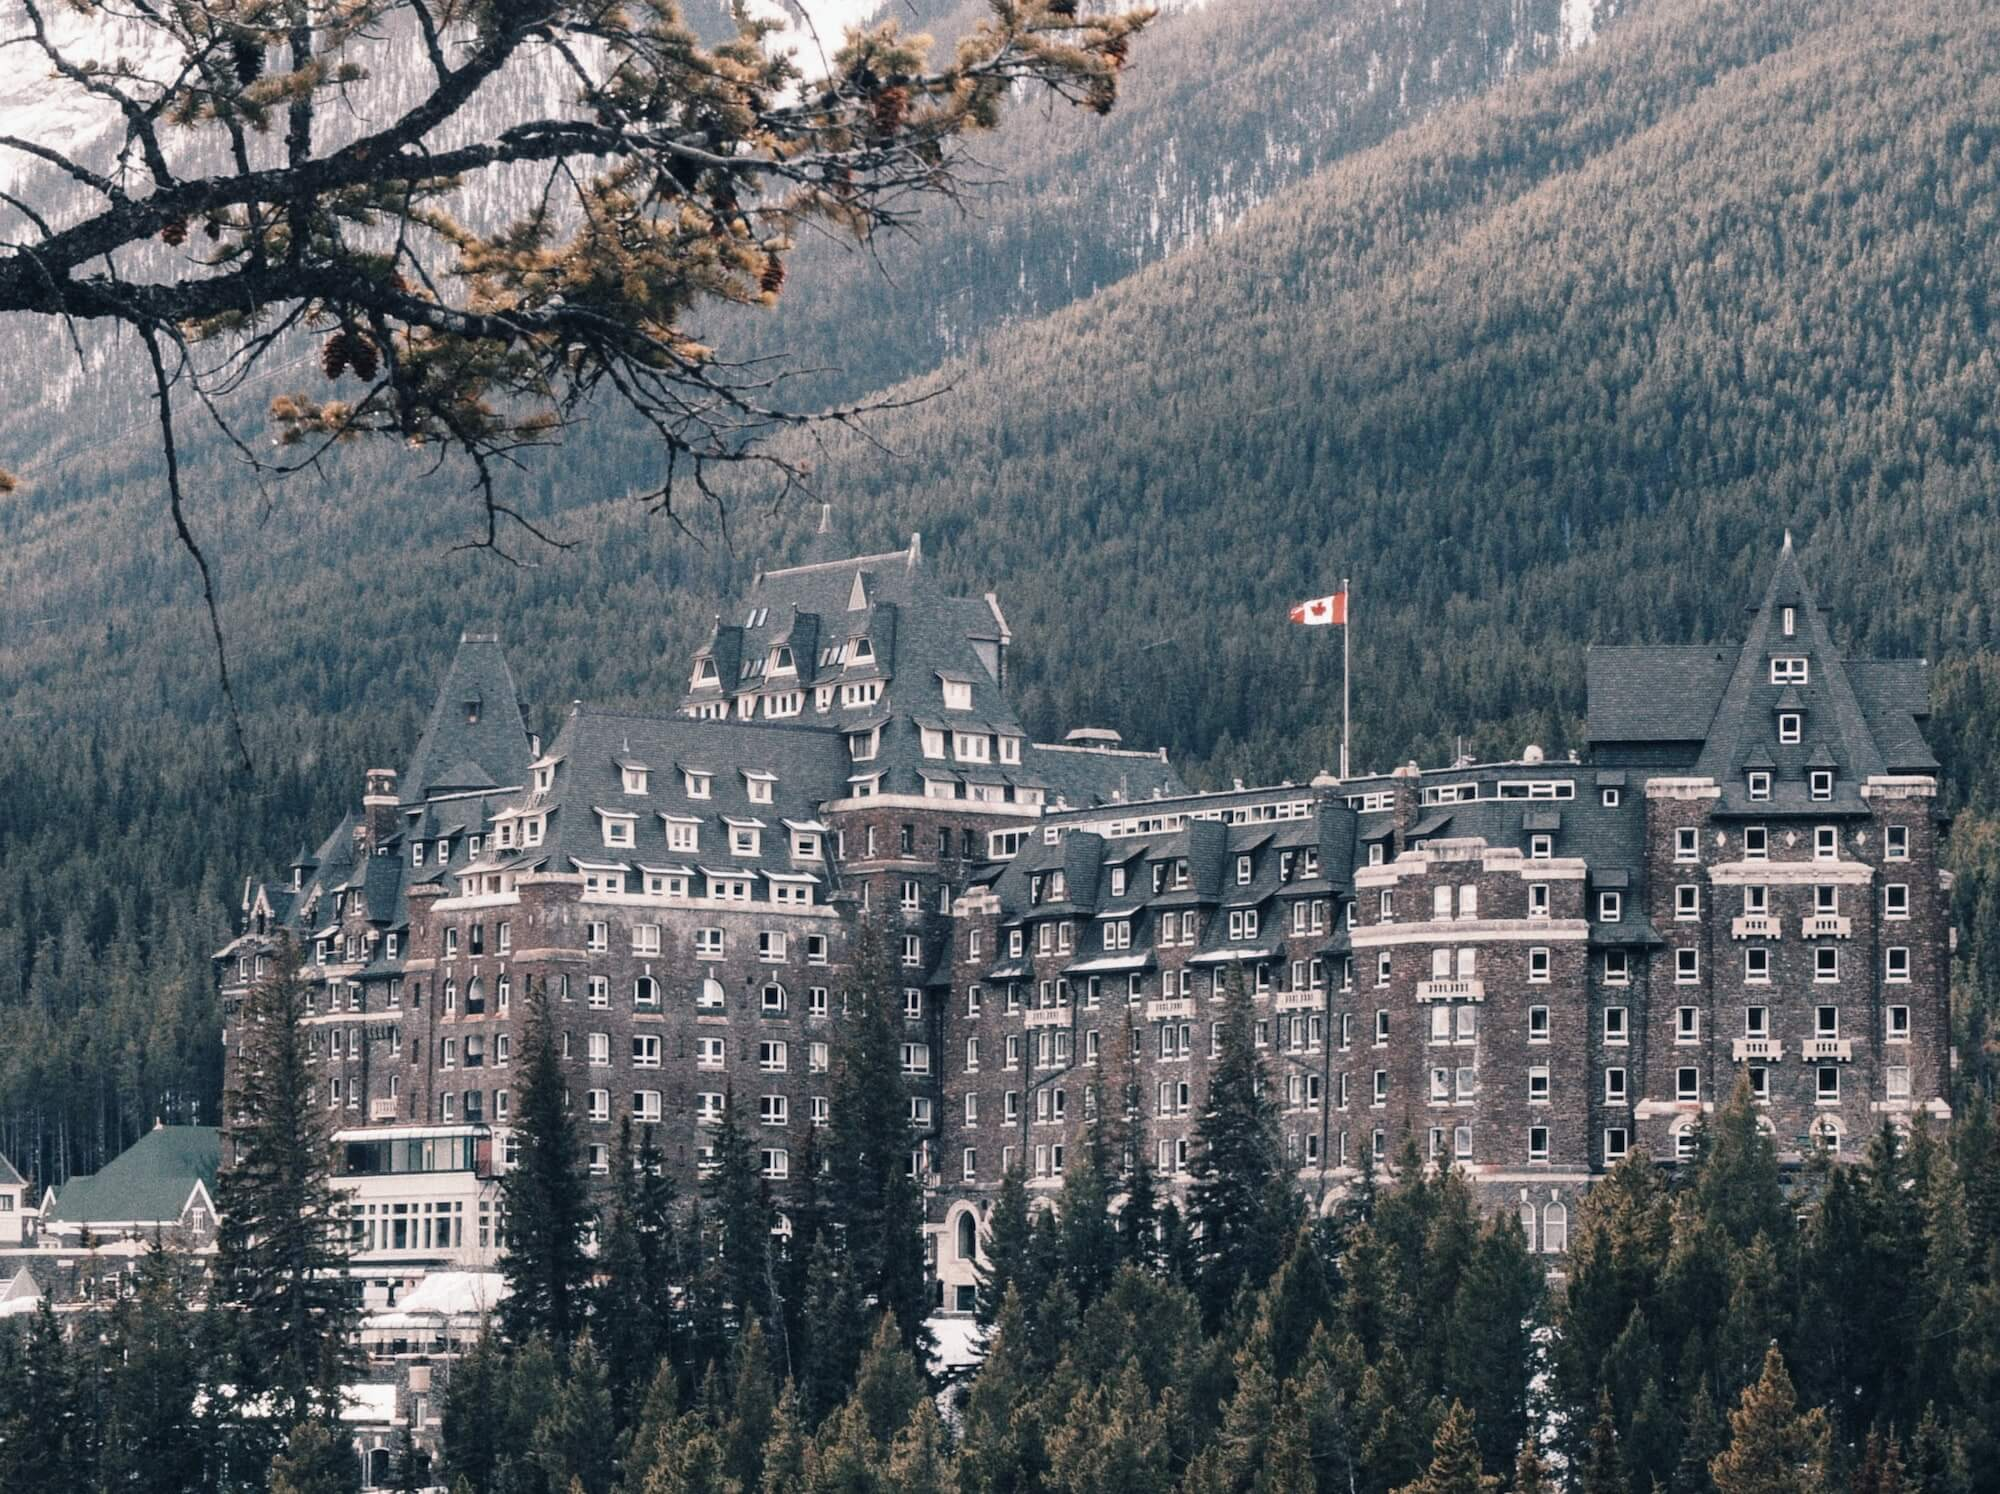 Banff Springs hotel in winter